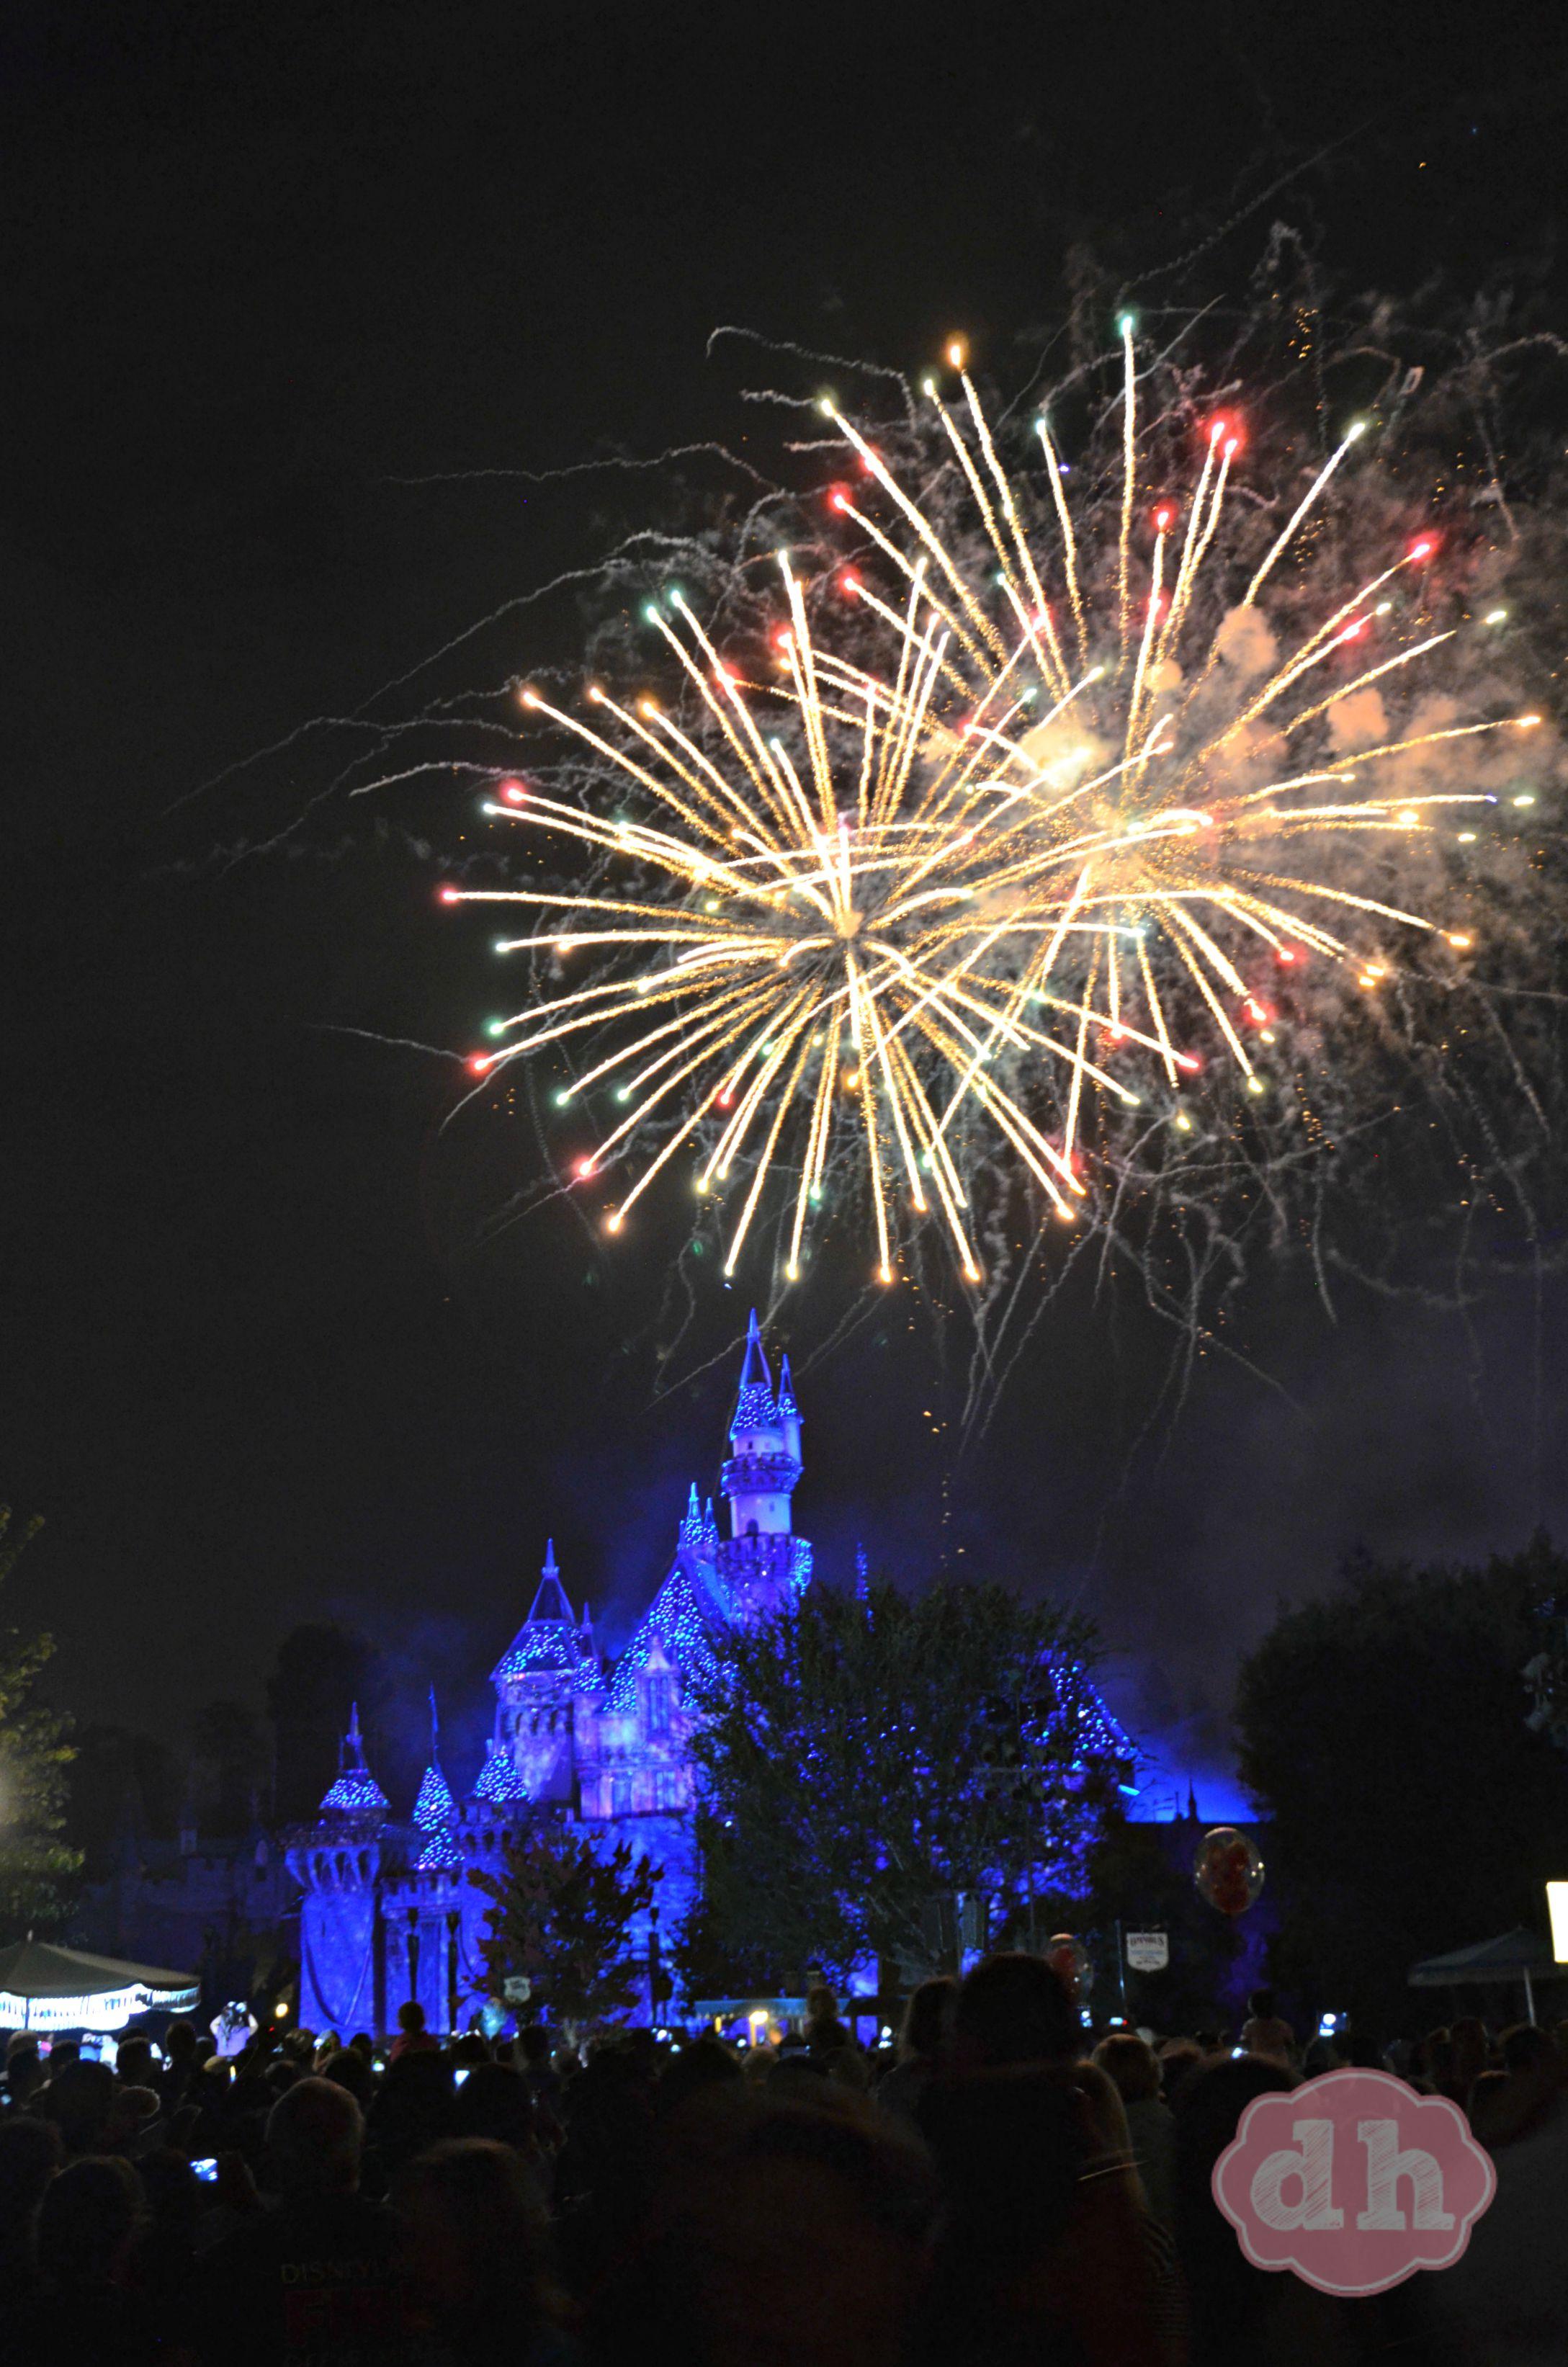 Celebrating 60 Years with Disneyland #Disneyland60